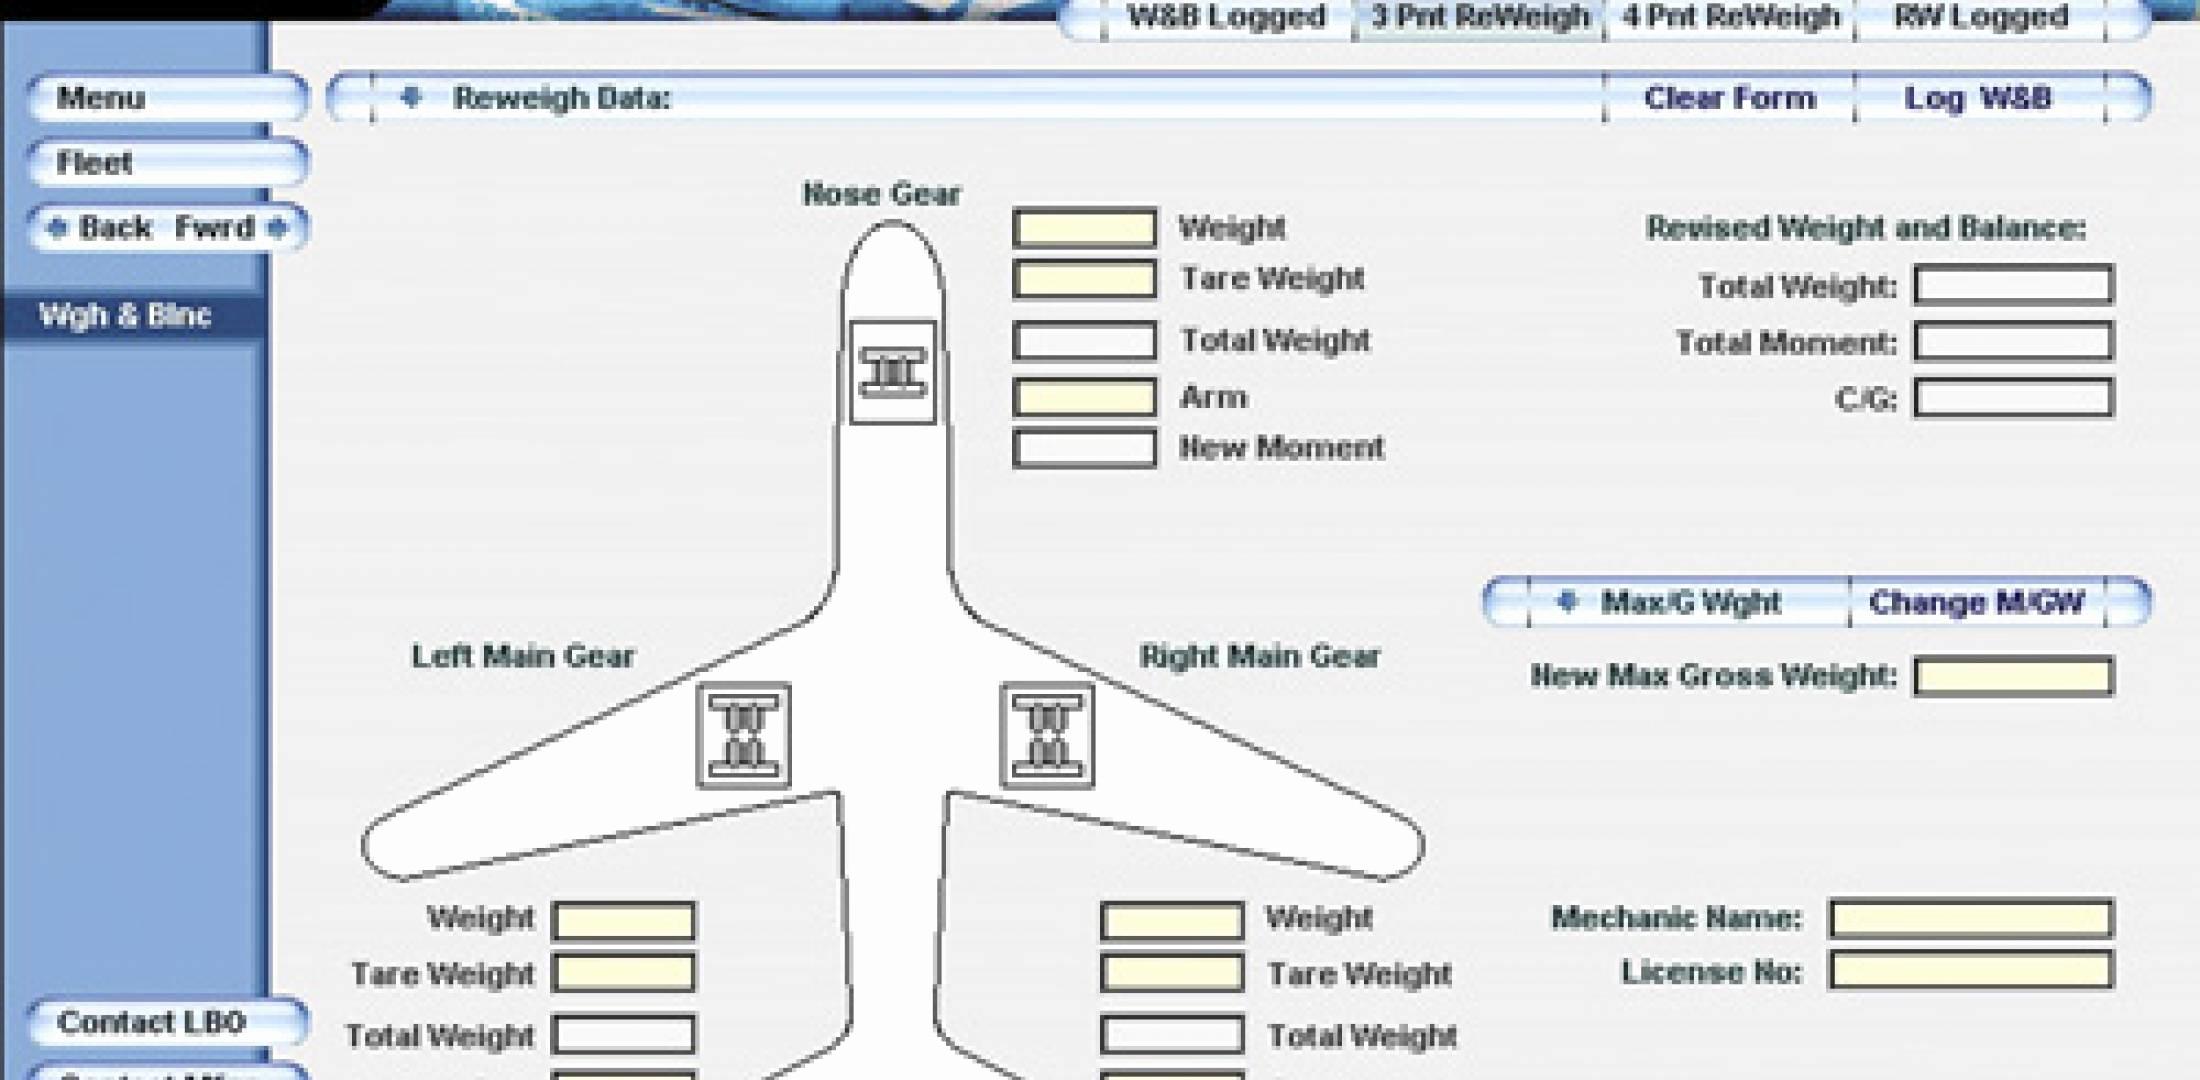 Aircraft Maintenance Tracking Spreadsheet Awesome Maintenance Intended For Maintenance Tracking Spreadsheet